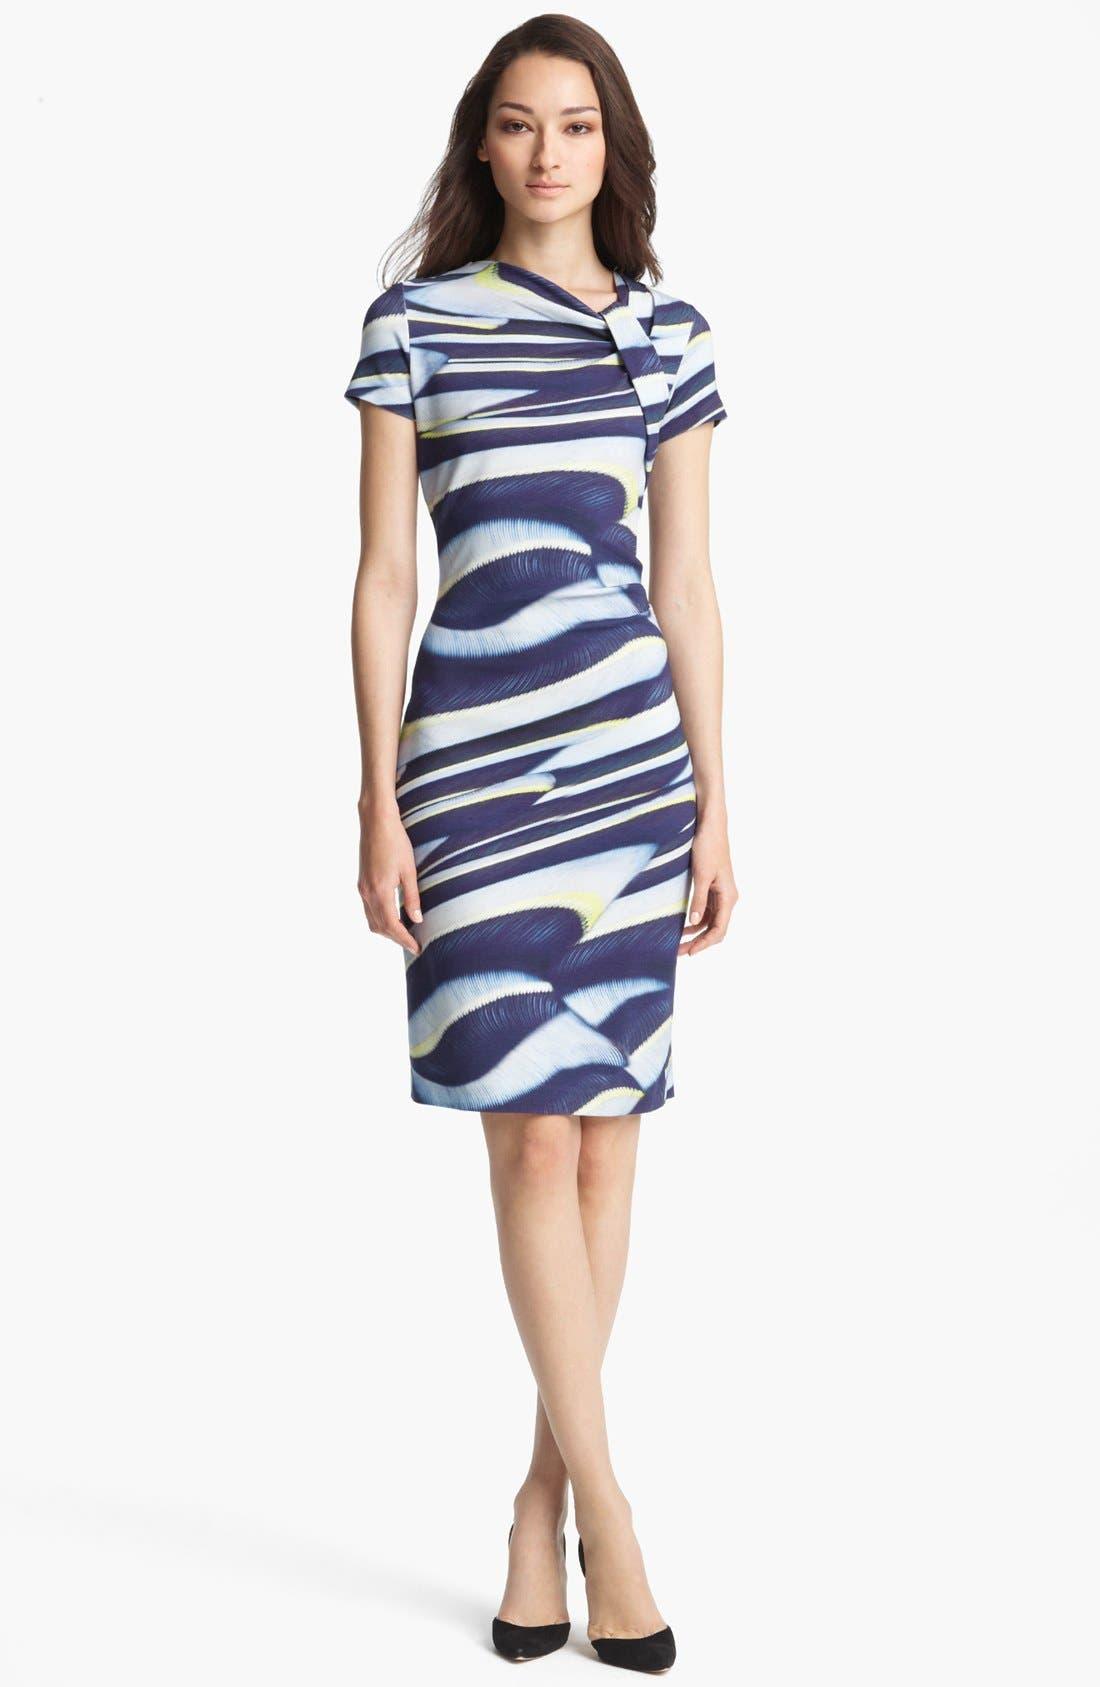 Alternate Image 1 Selected - ESCADA 'Plumeria' Print Dress